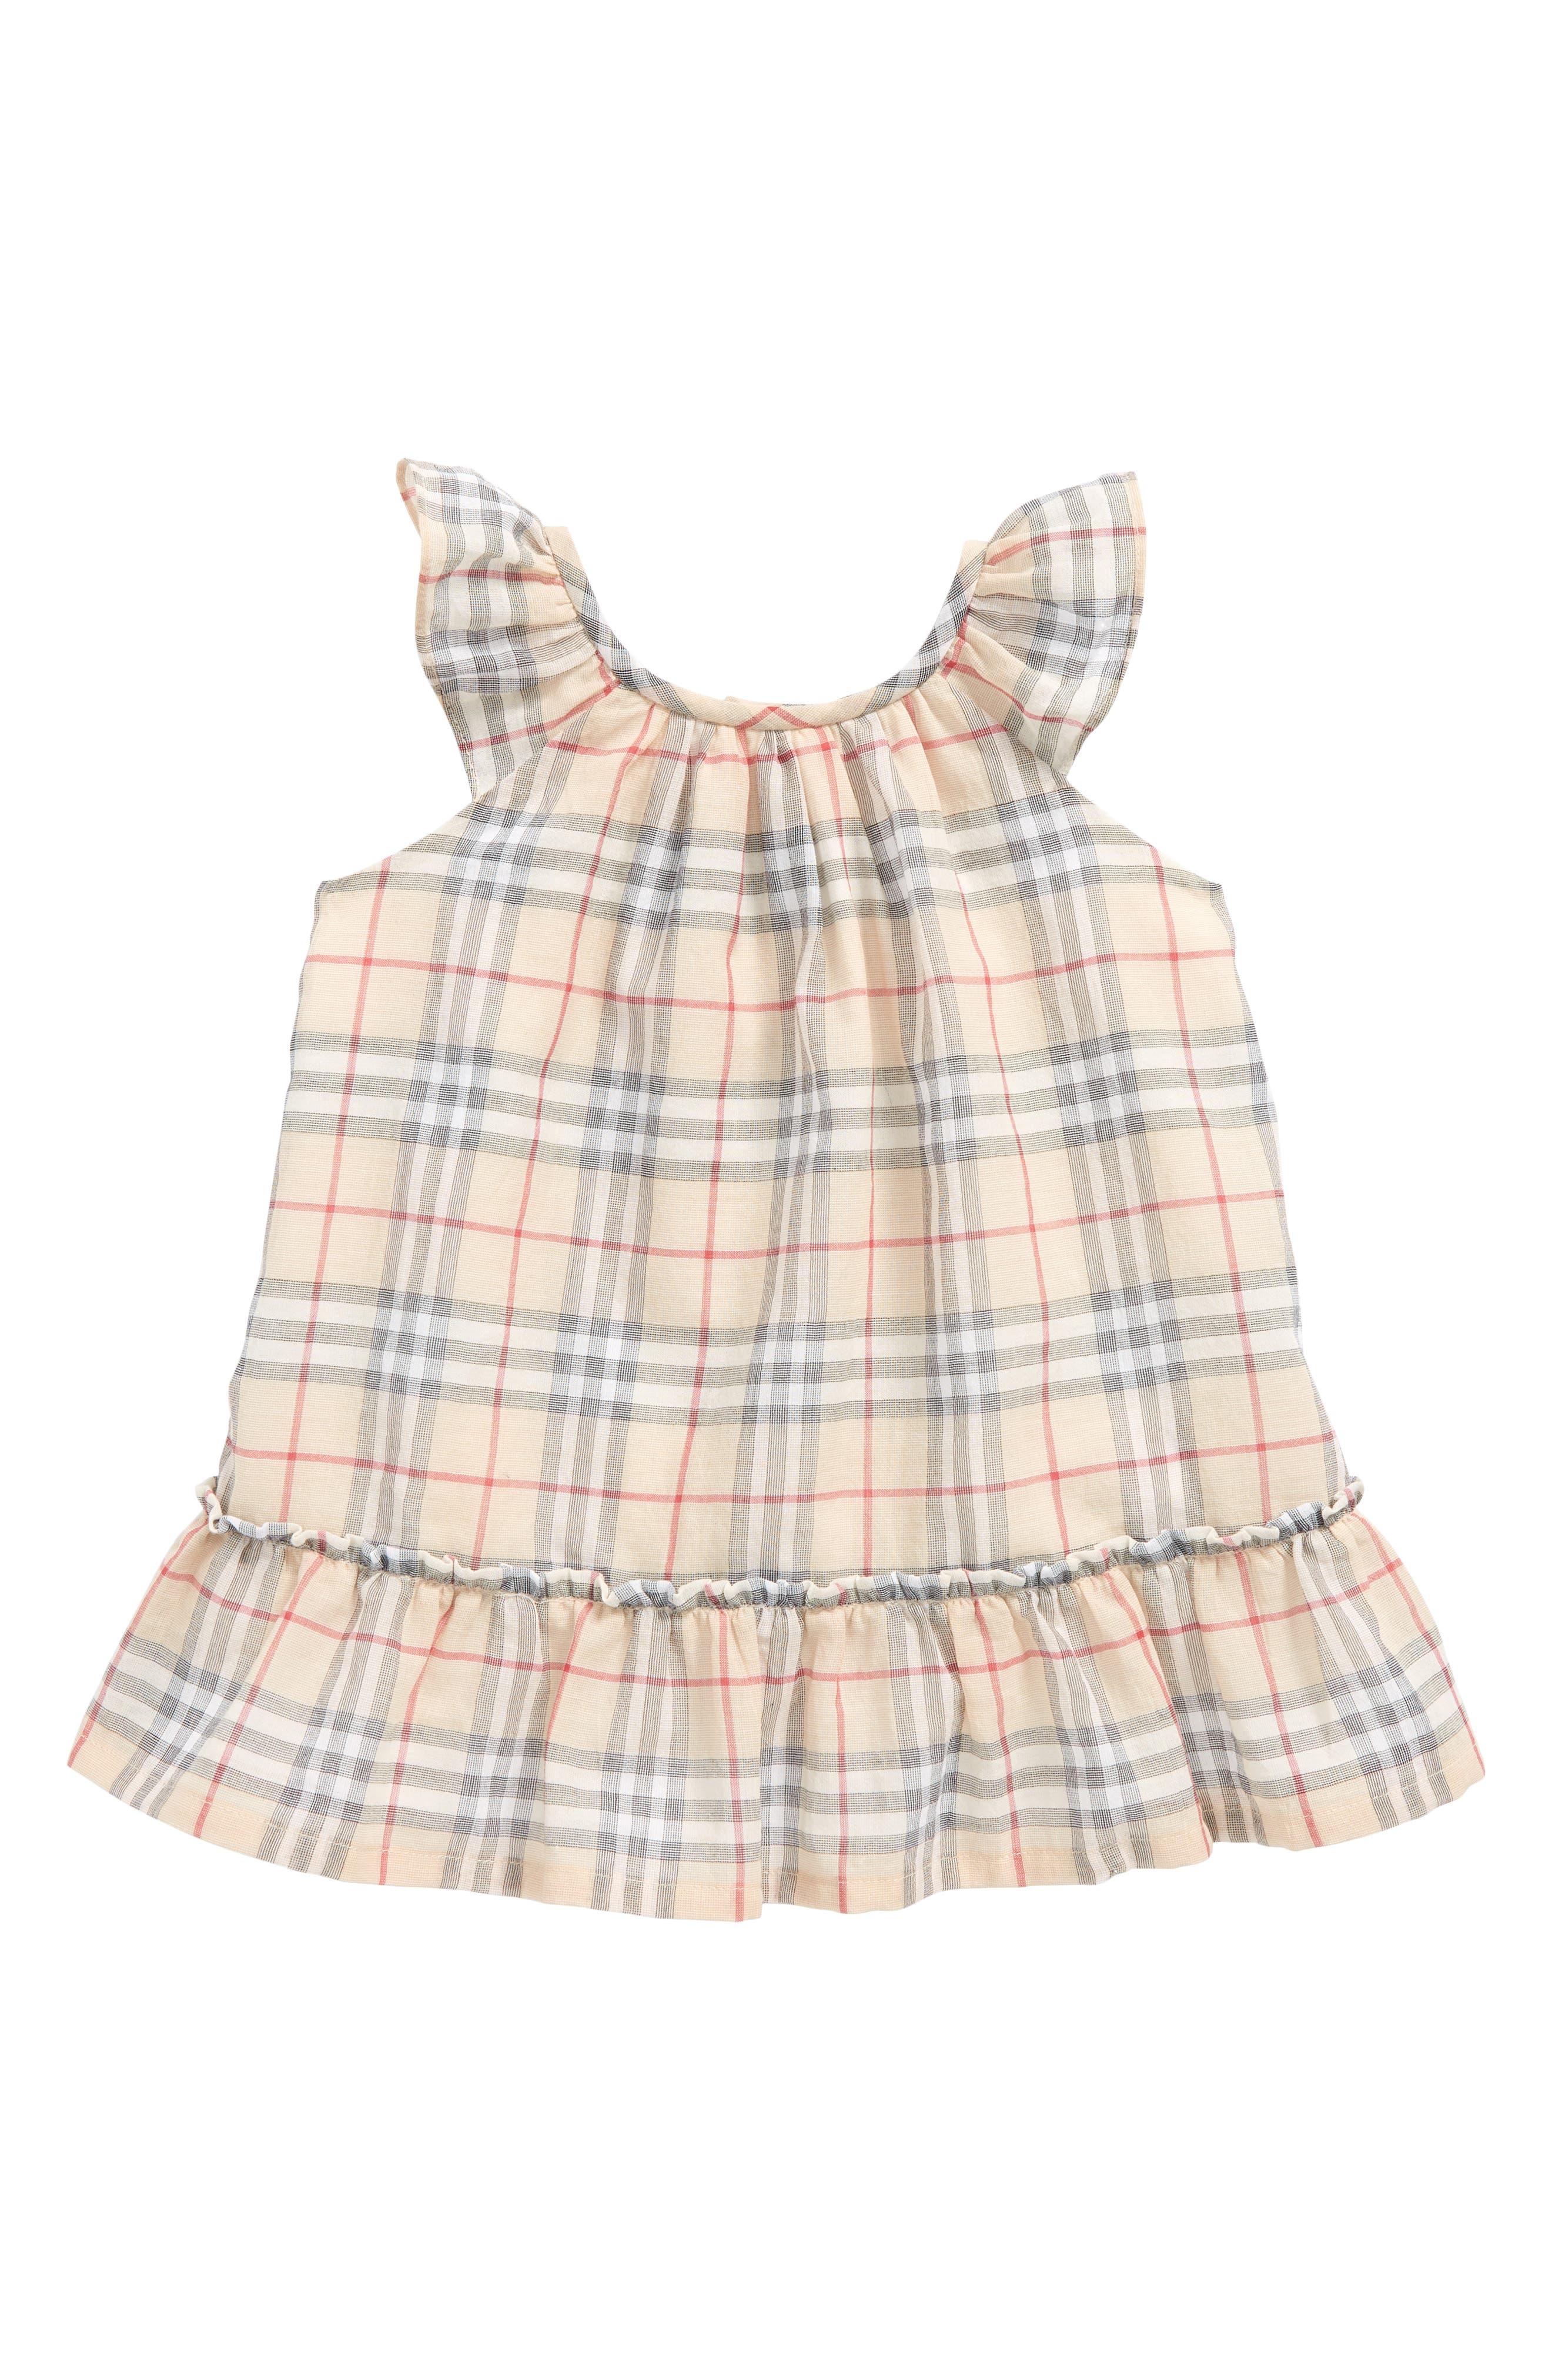 Tania Check Dress,                         Main,                         color, 275